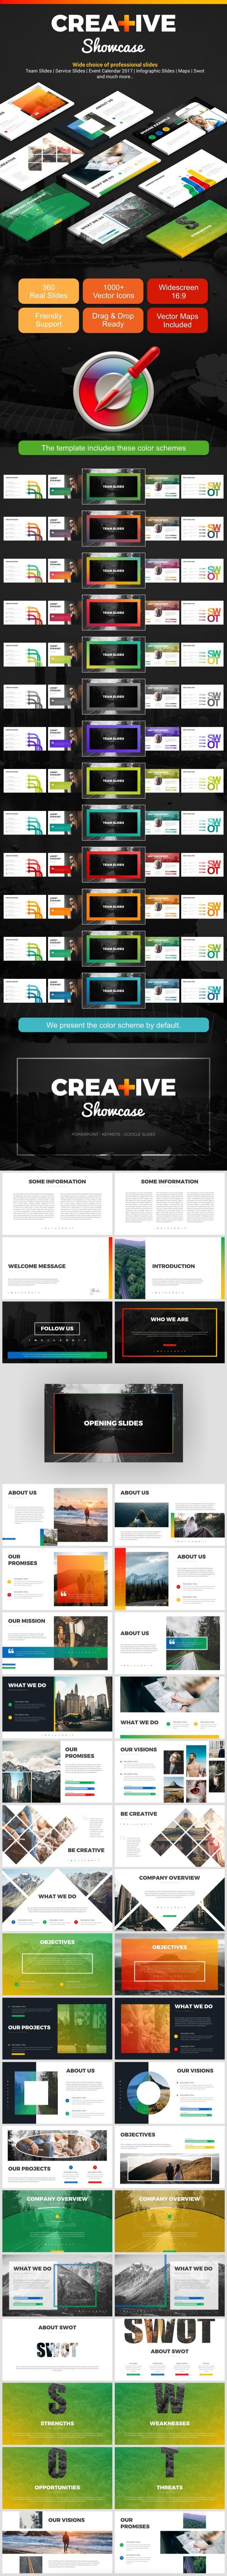 Creative Showcase - Business PowerPoint Templates